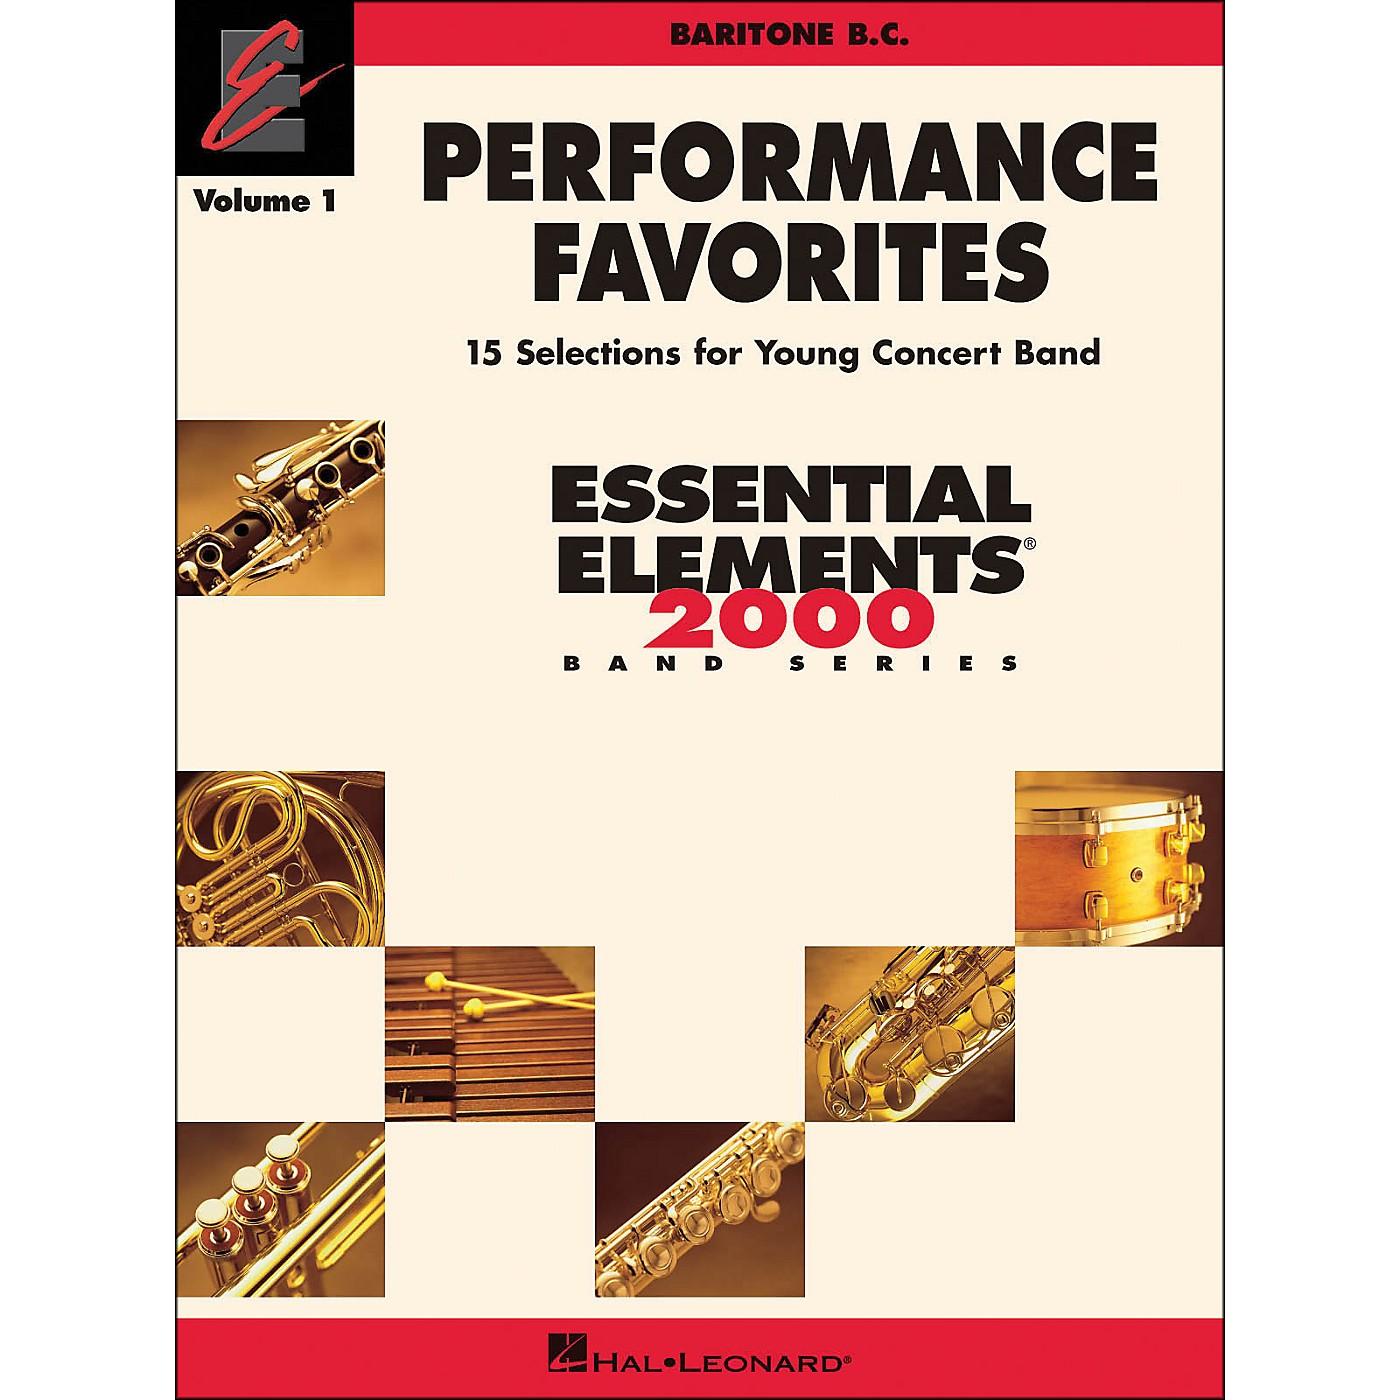 Hal Leonard Performance Favorites Volume 1 Baritone B.C. thumbnail